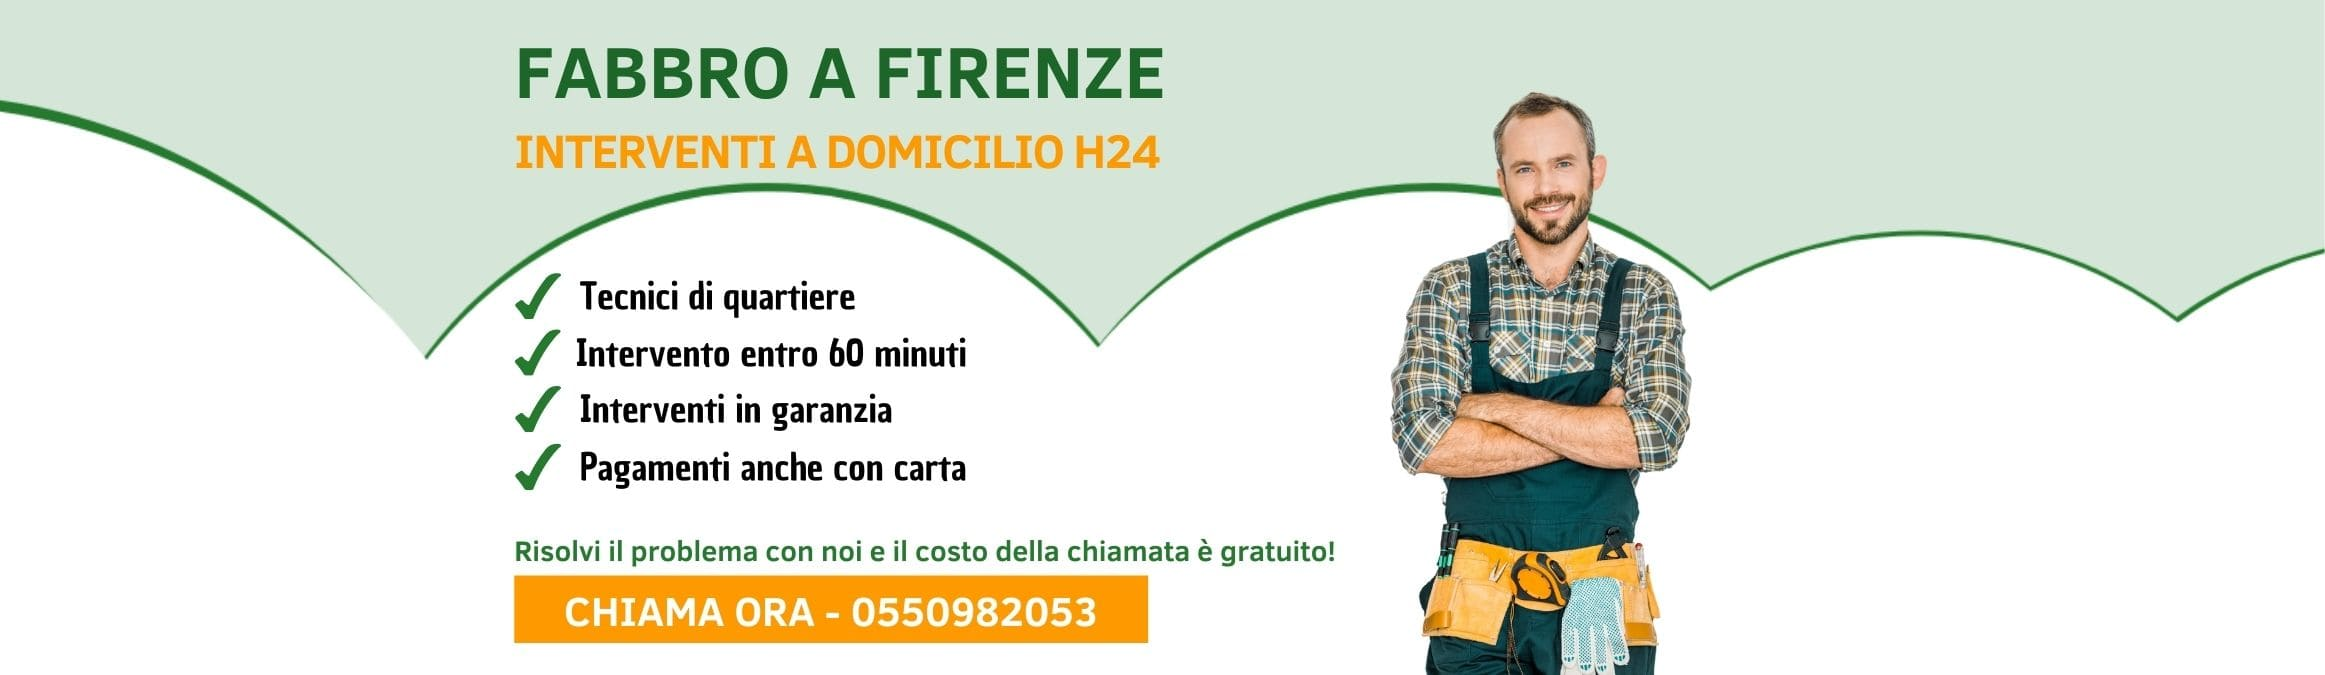 Fabbro Firenze - Pronto Intervento h24